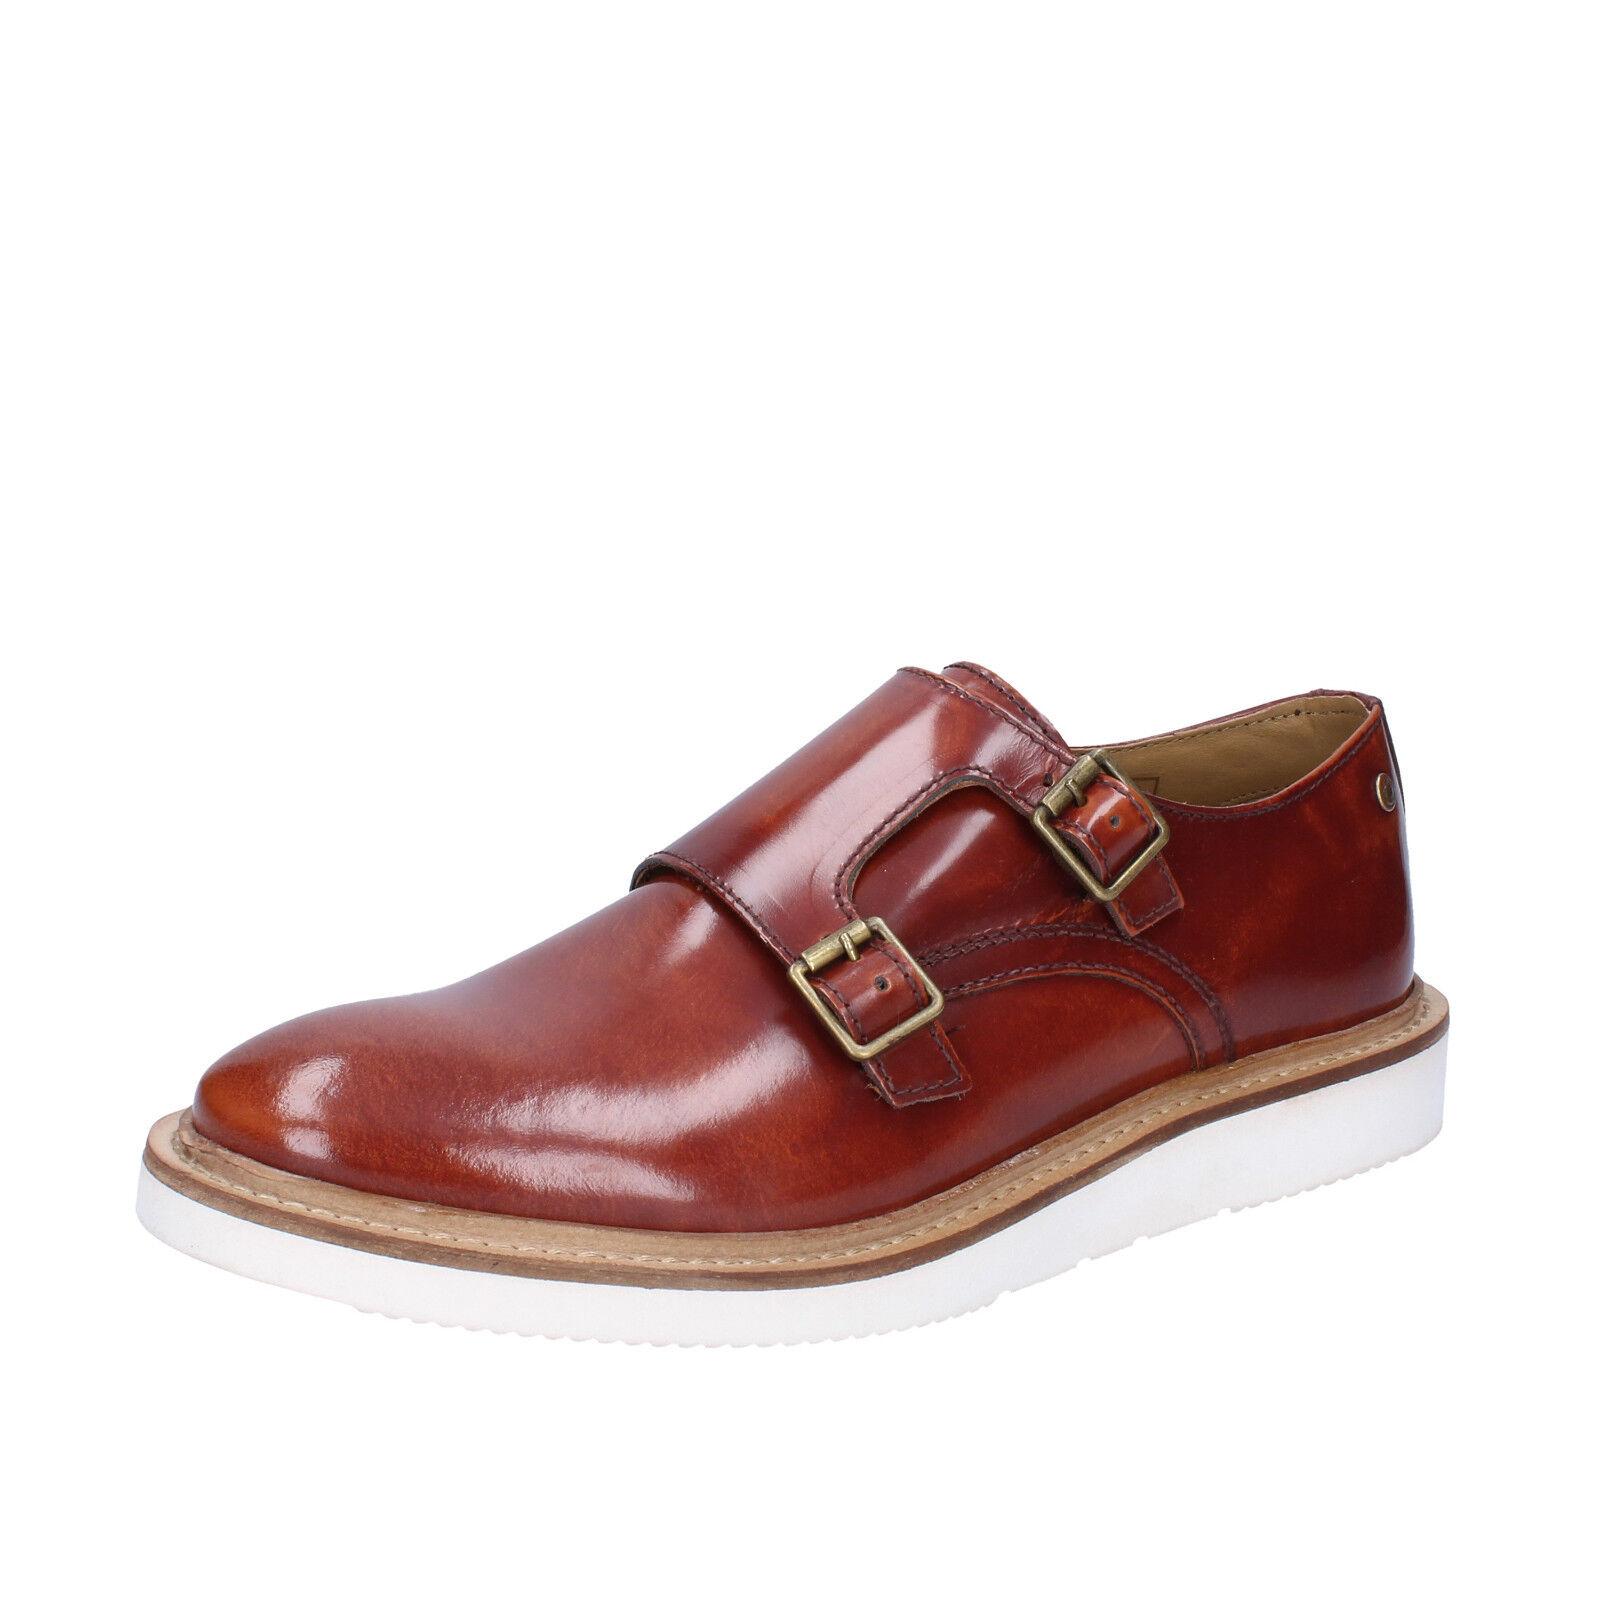 Mens shoes BASE LONDON 9 (EU 43) elegant brown shiny leather  BZ428-E